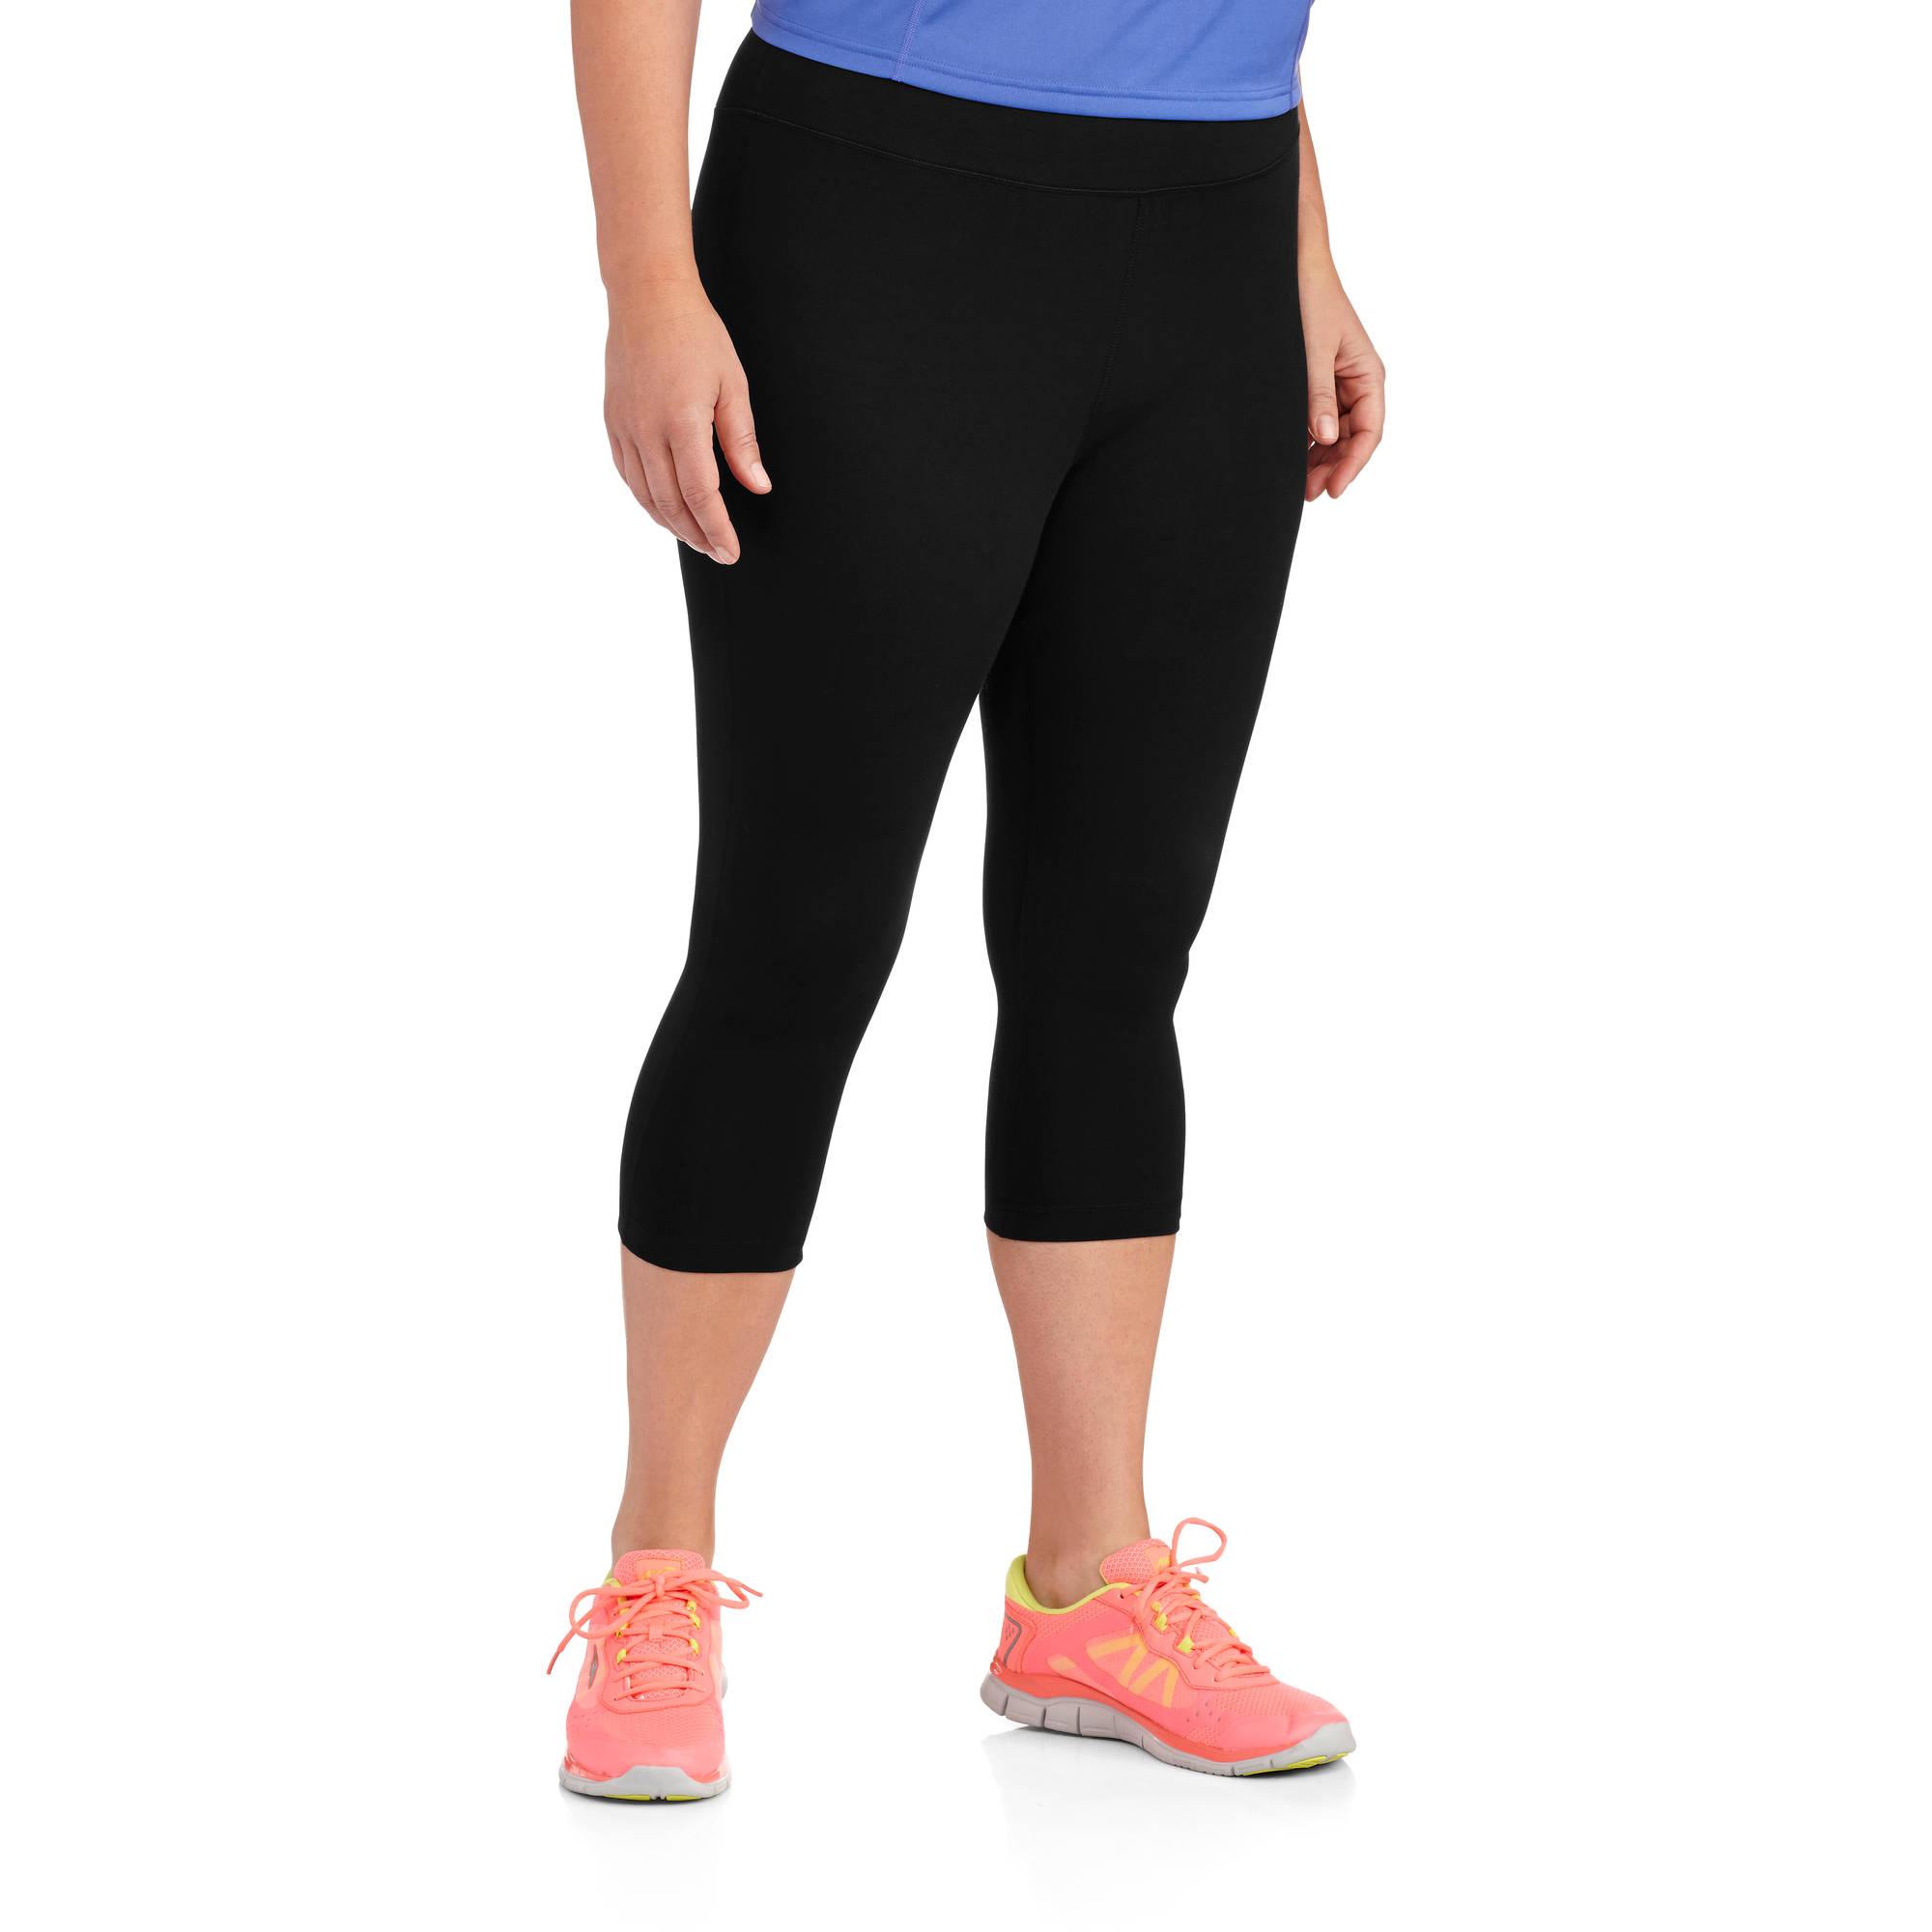 danskin now women's plus-size dri-more capri core legging